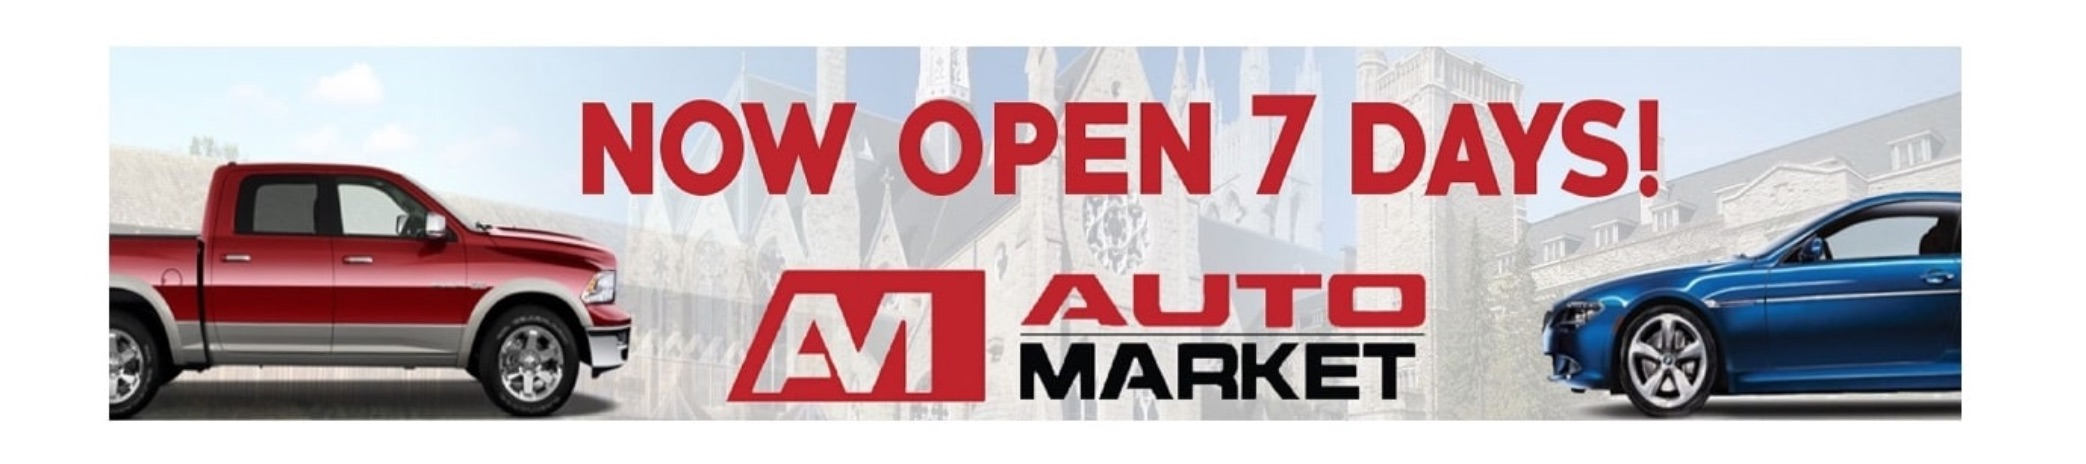 automarket now open 7 days